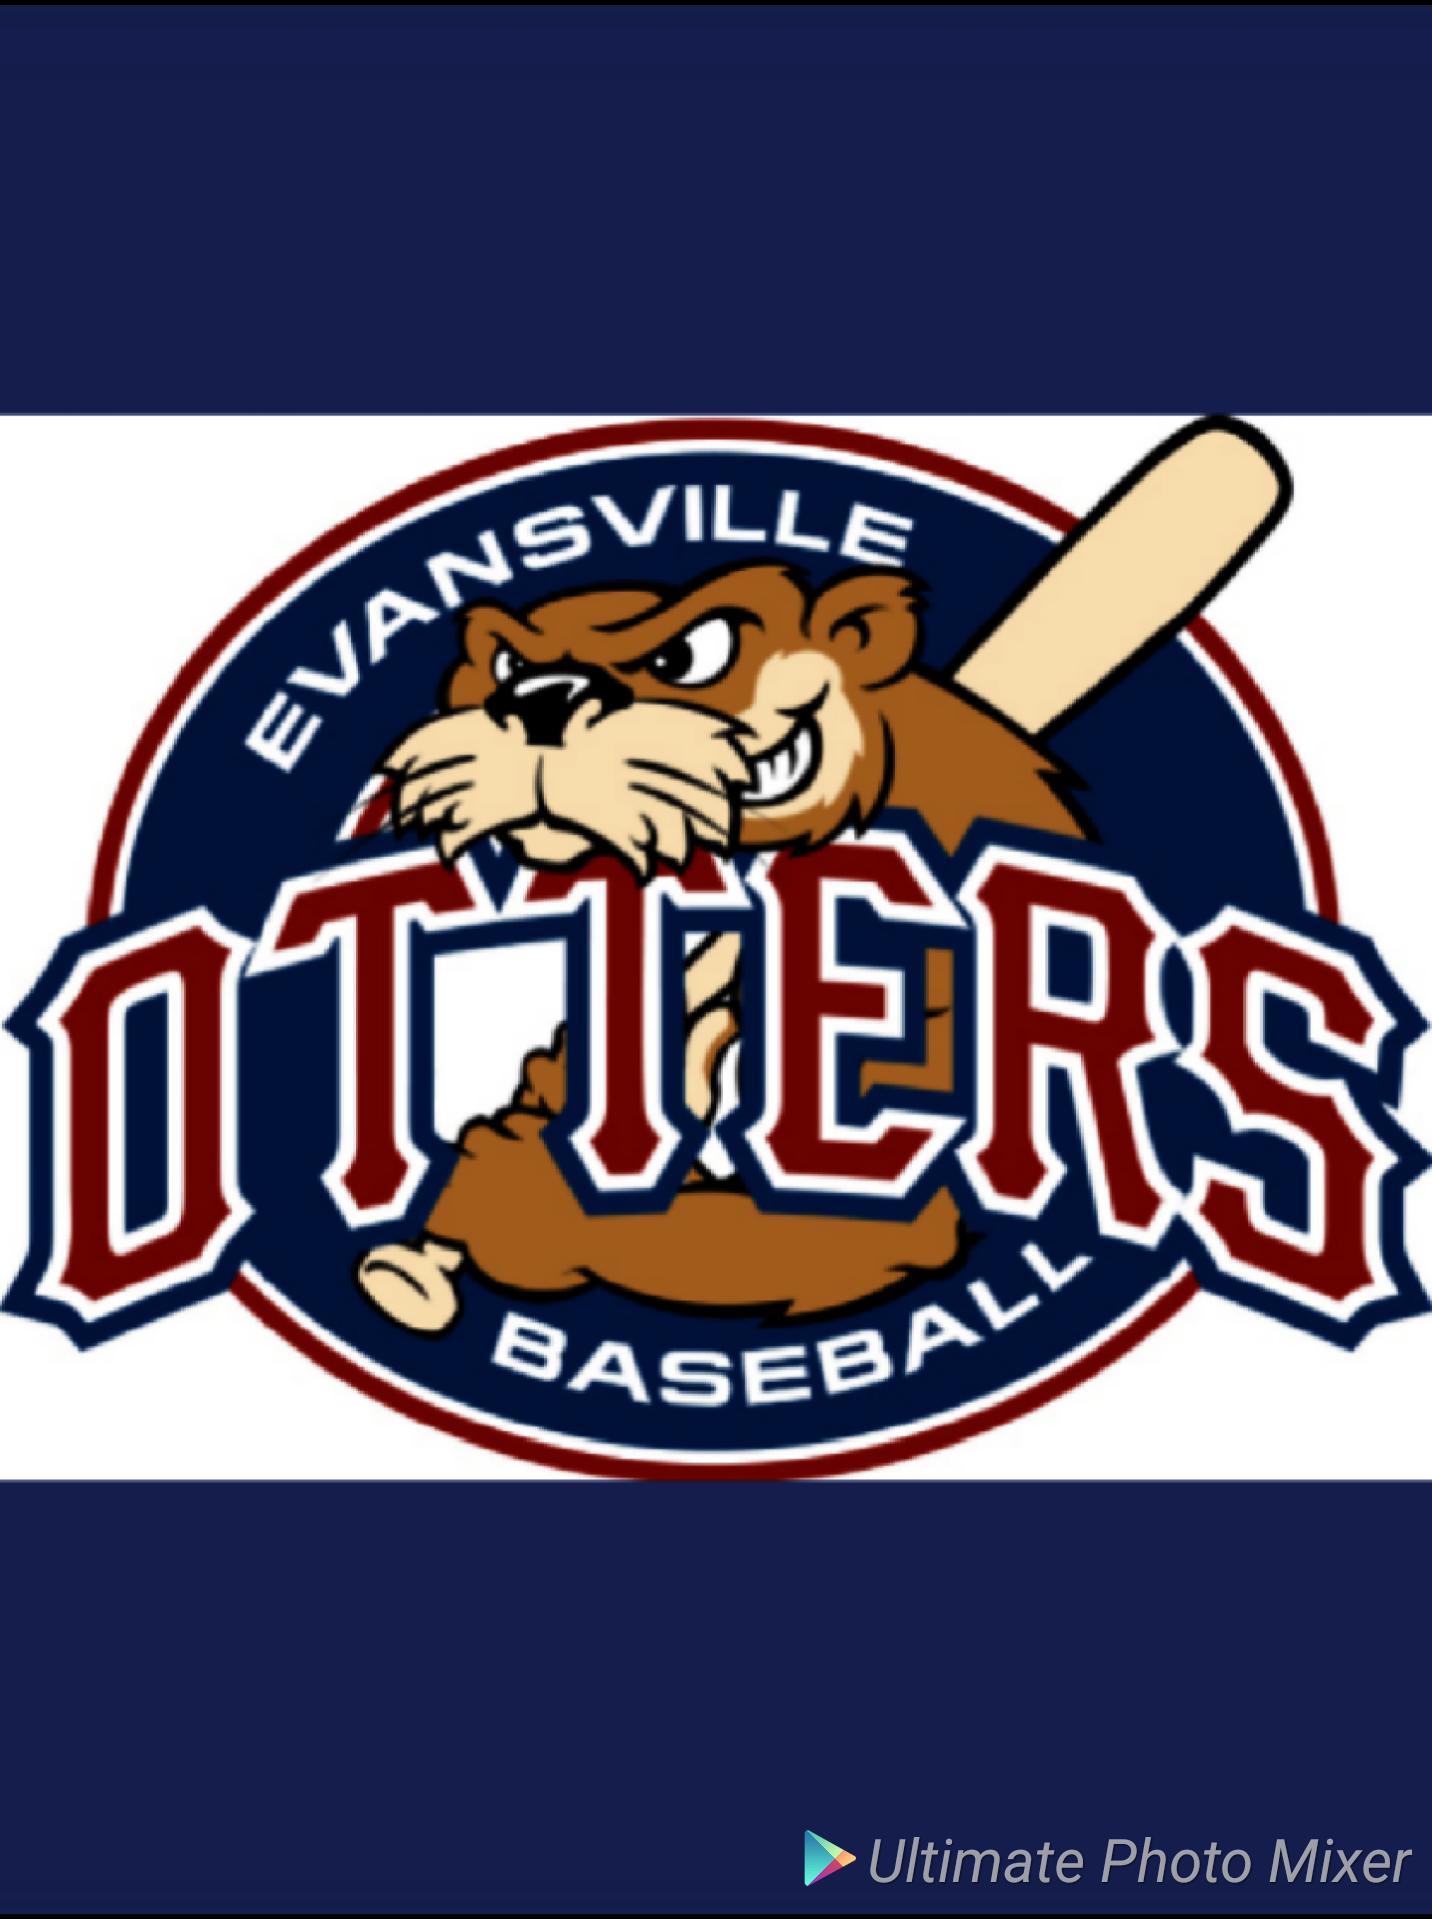 Evansville Otters 11U Baseball